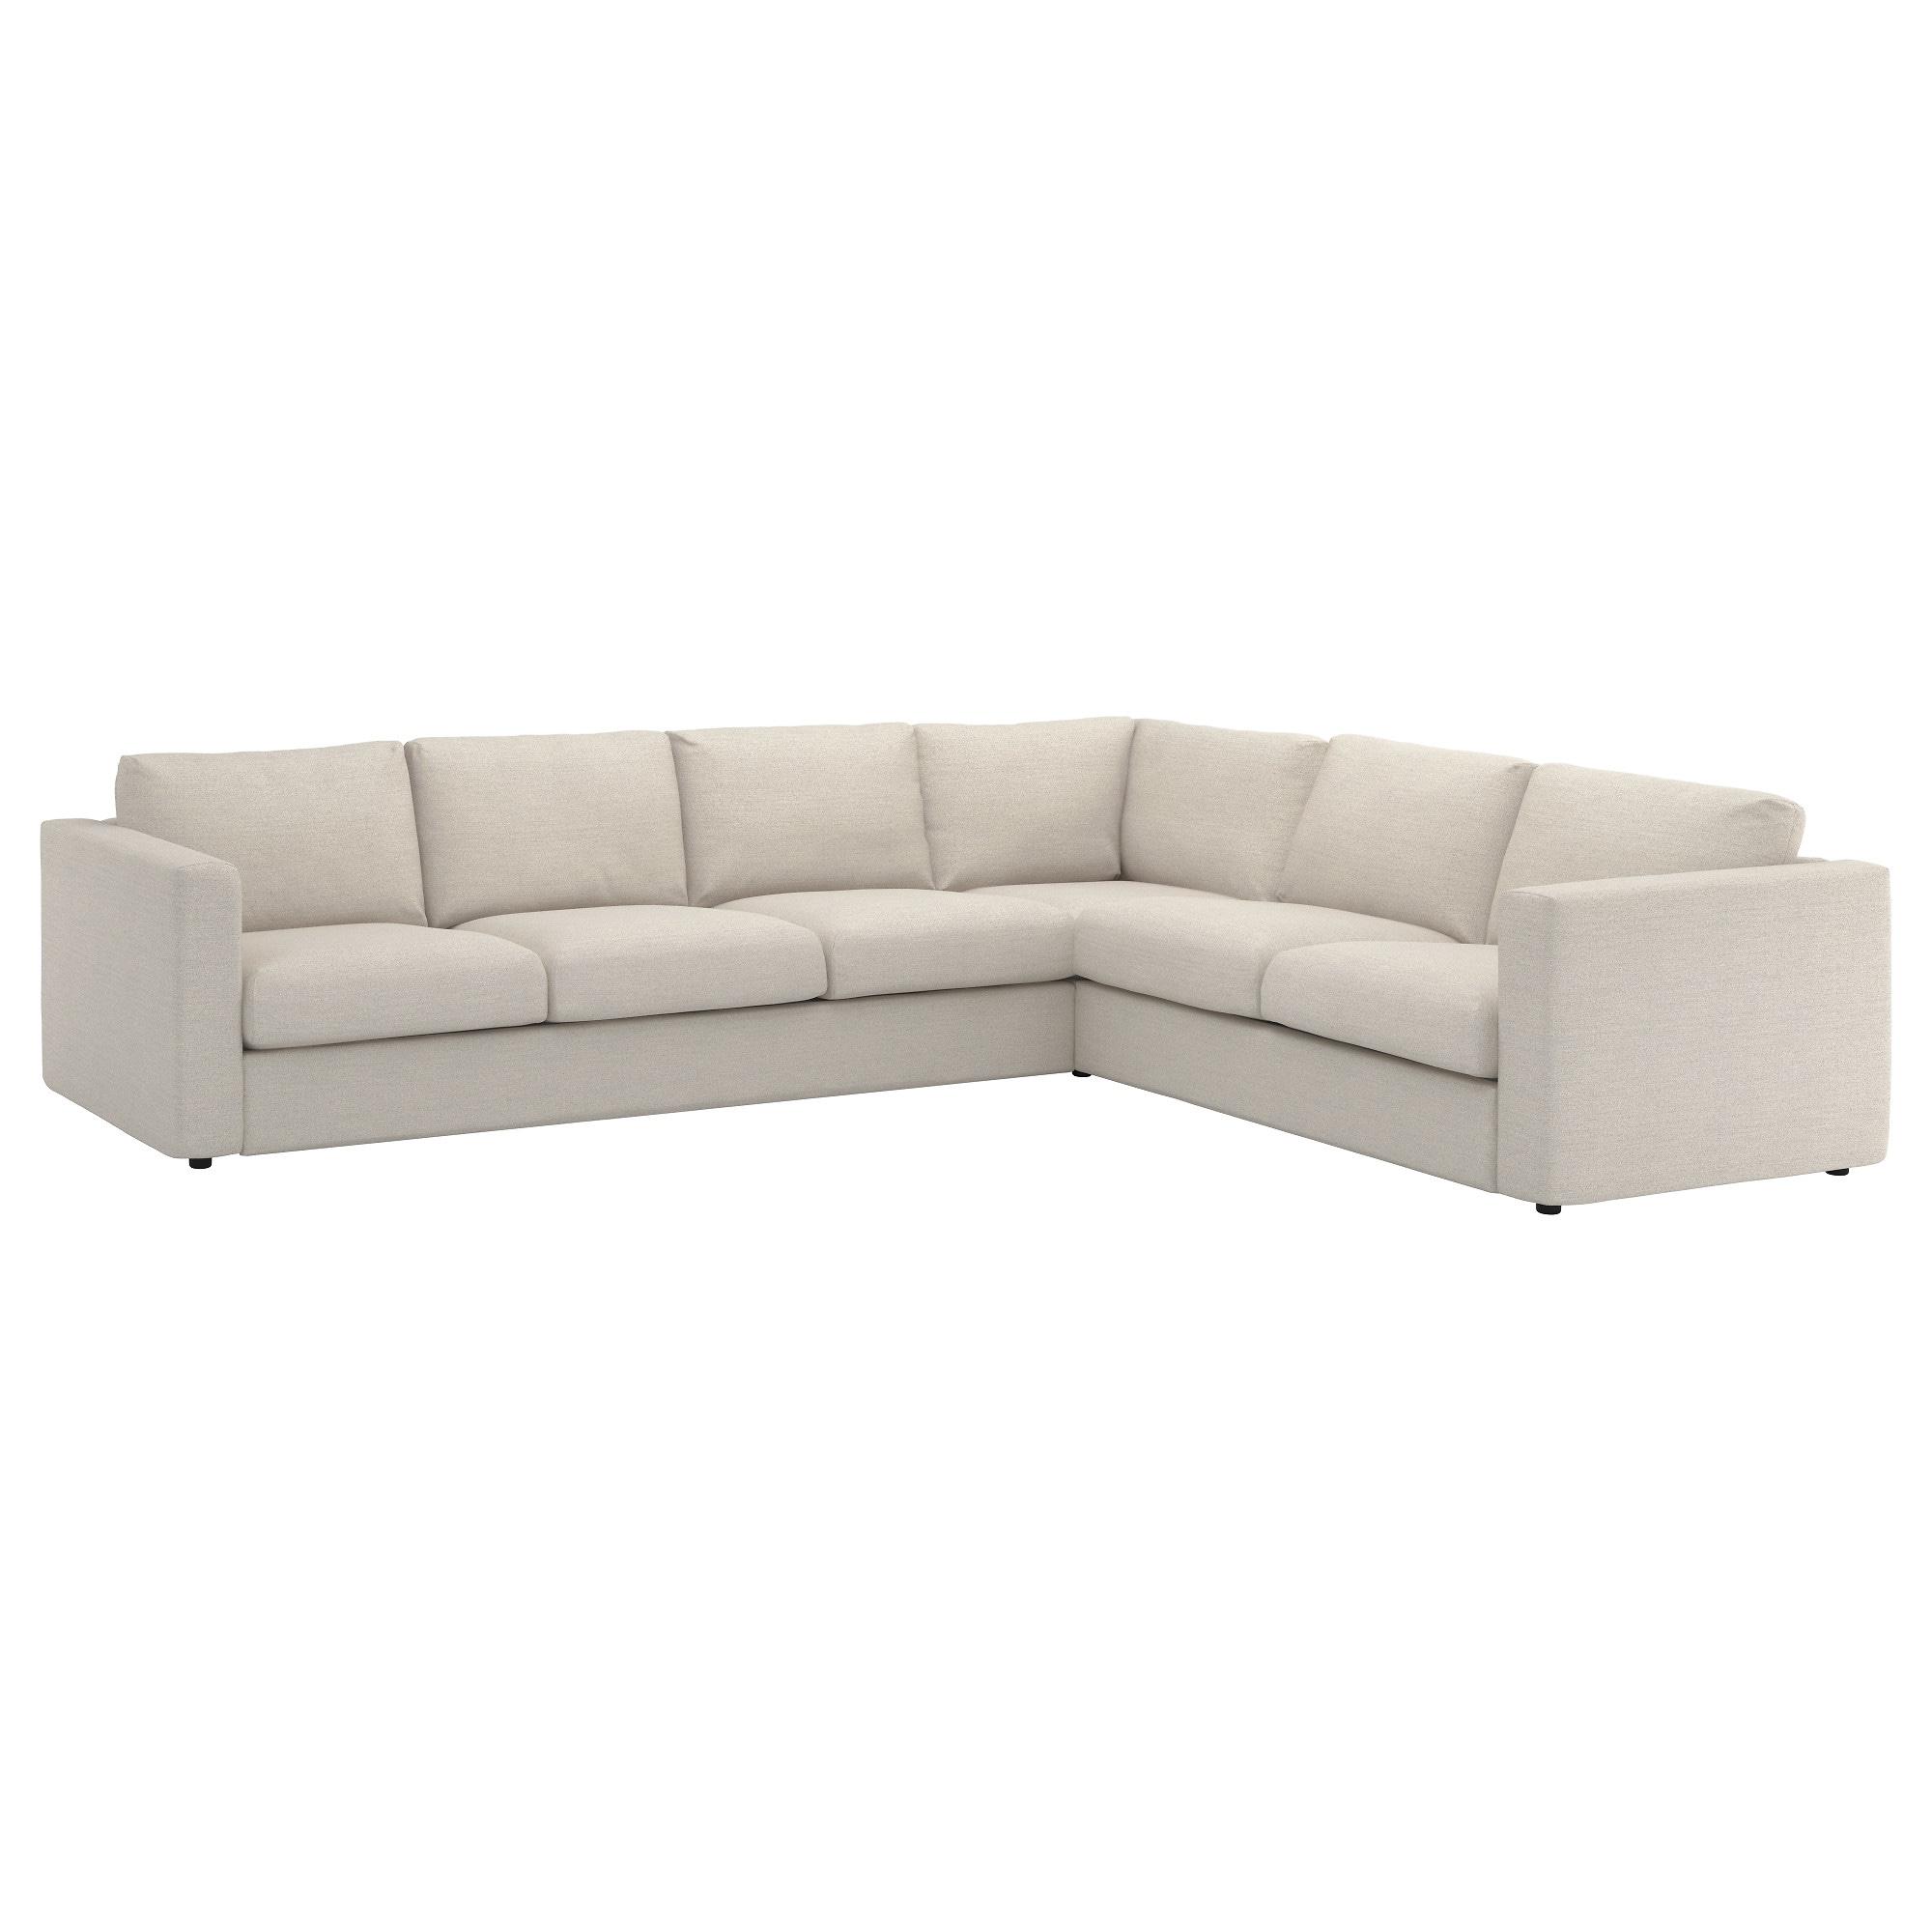 Sofa Rinconera Ikea Zwdg Vimle sofà 5 Plazas Esquina Gunnared Beige Ikea